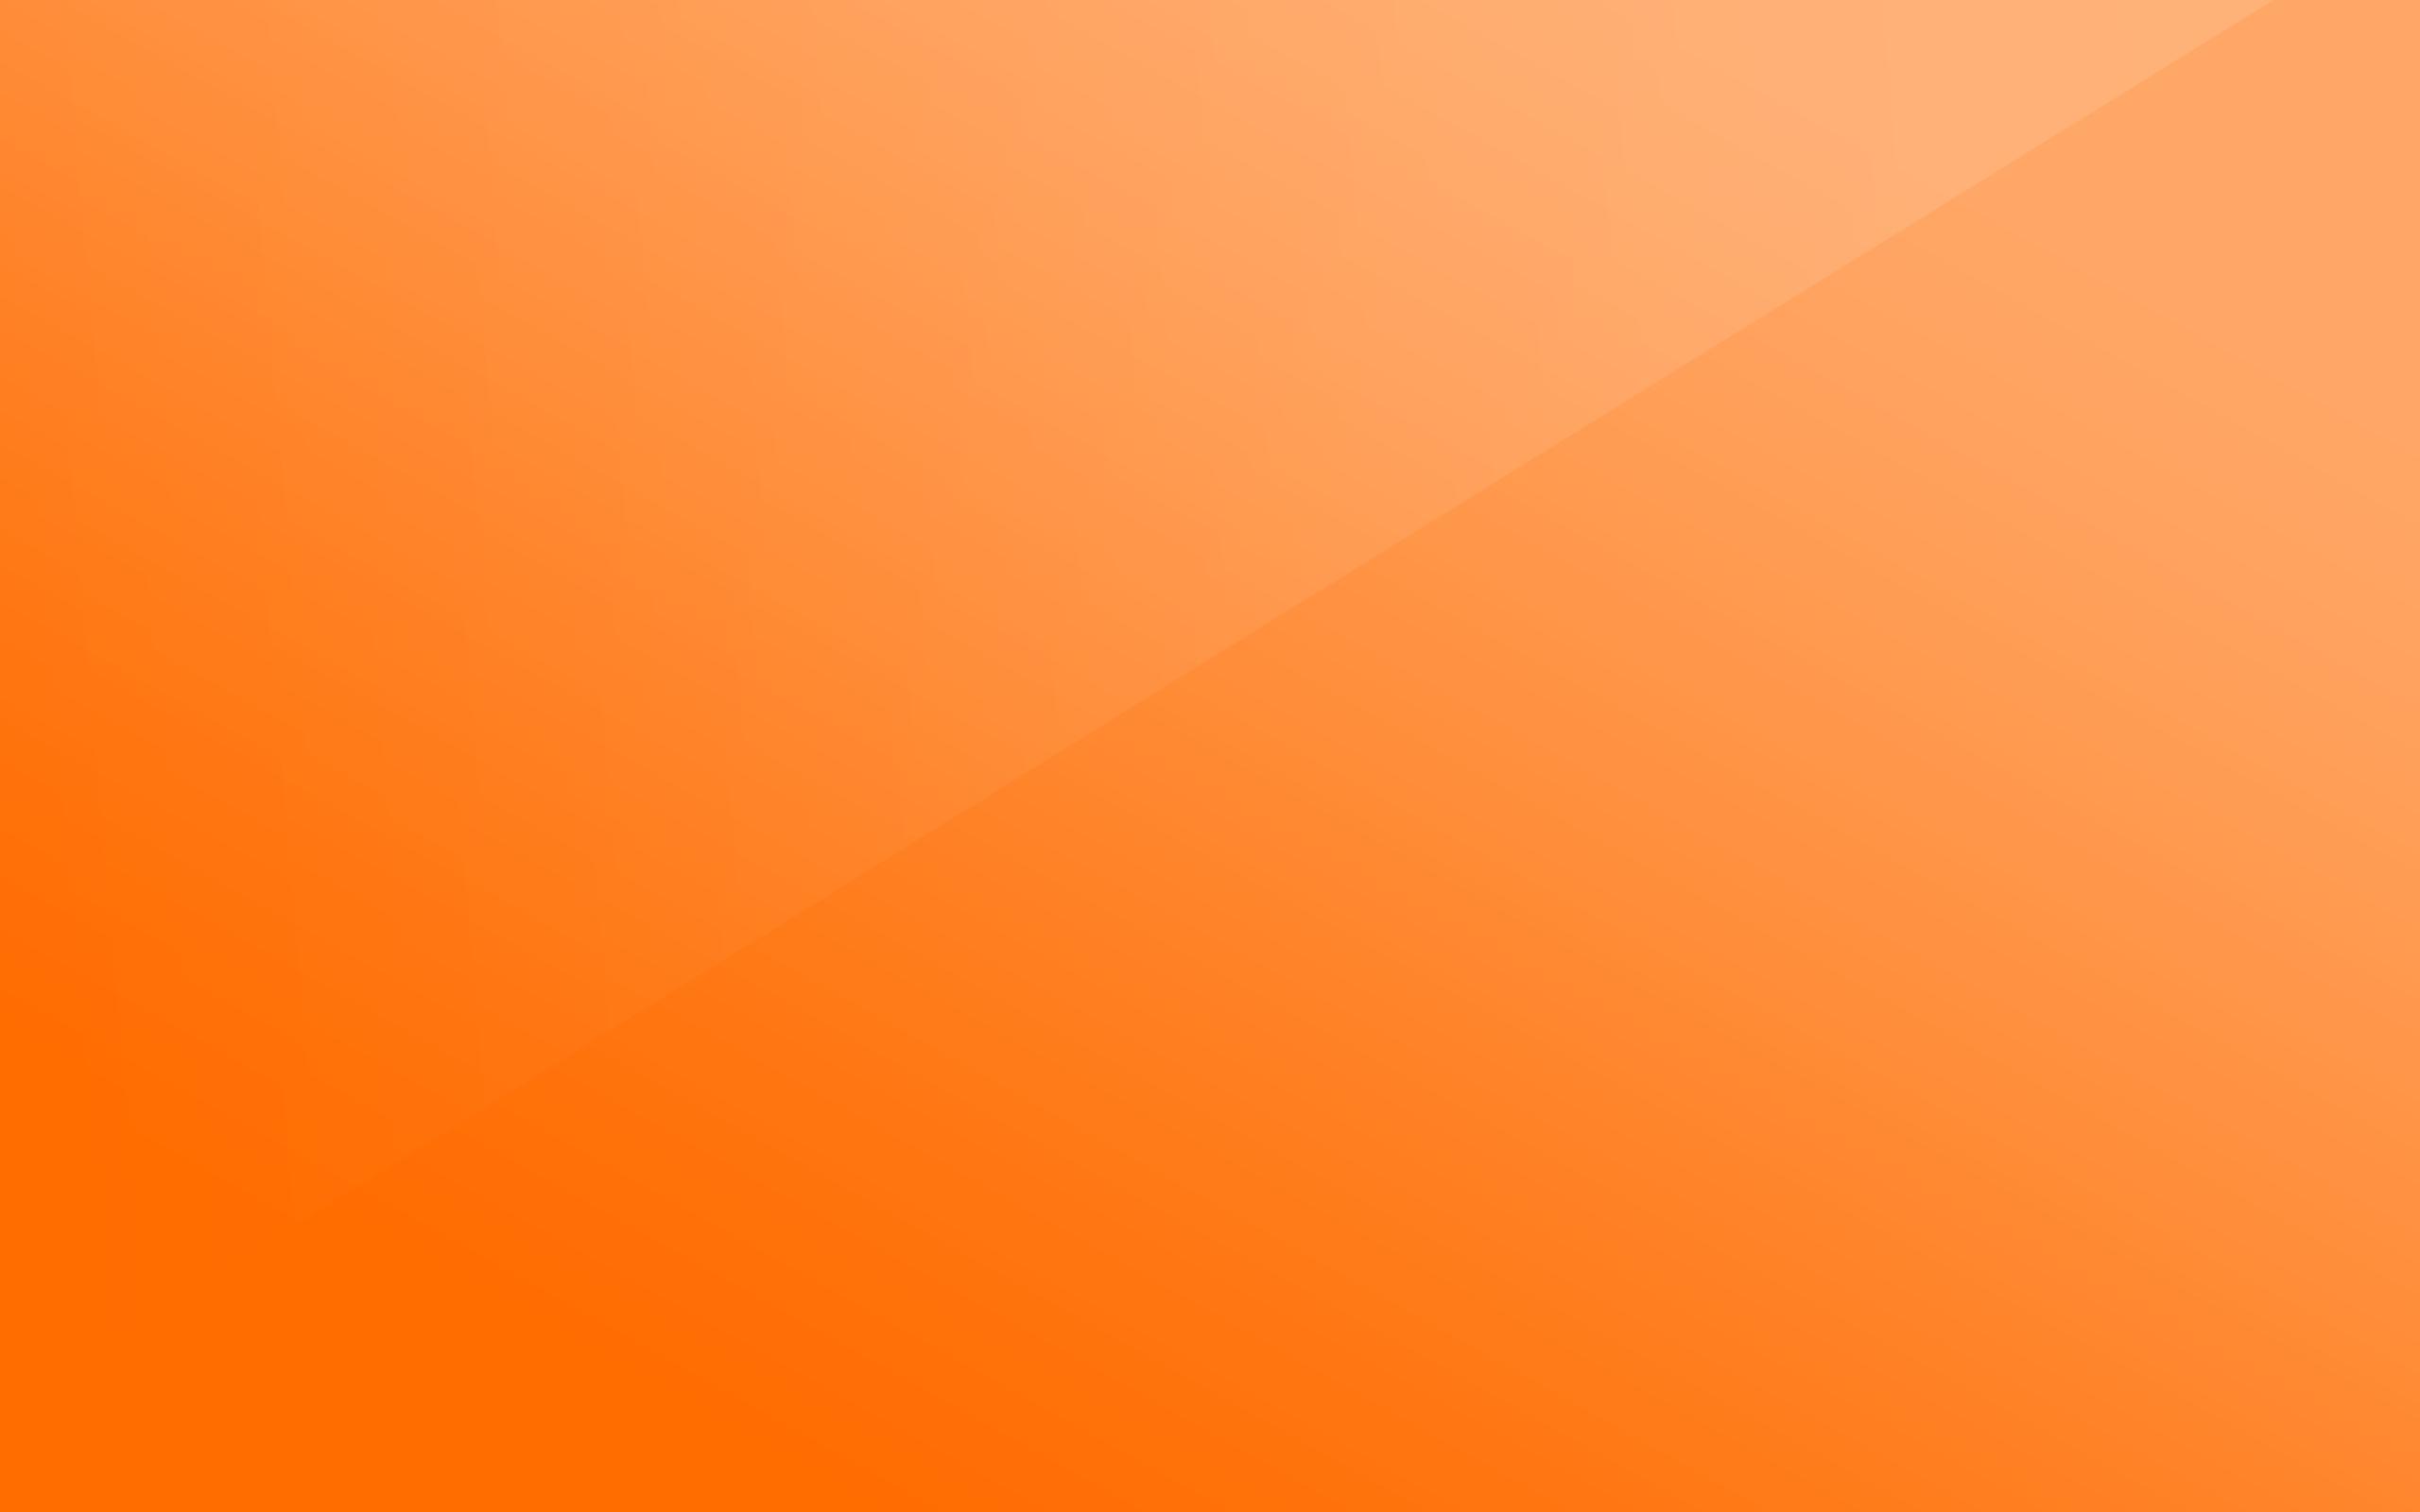 Wallpaper  orange line light background 2560x1600